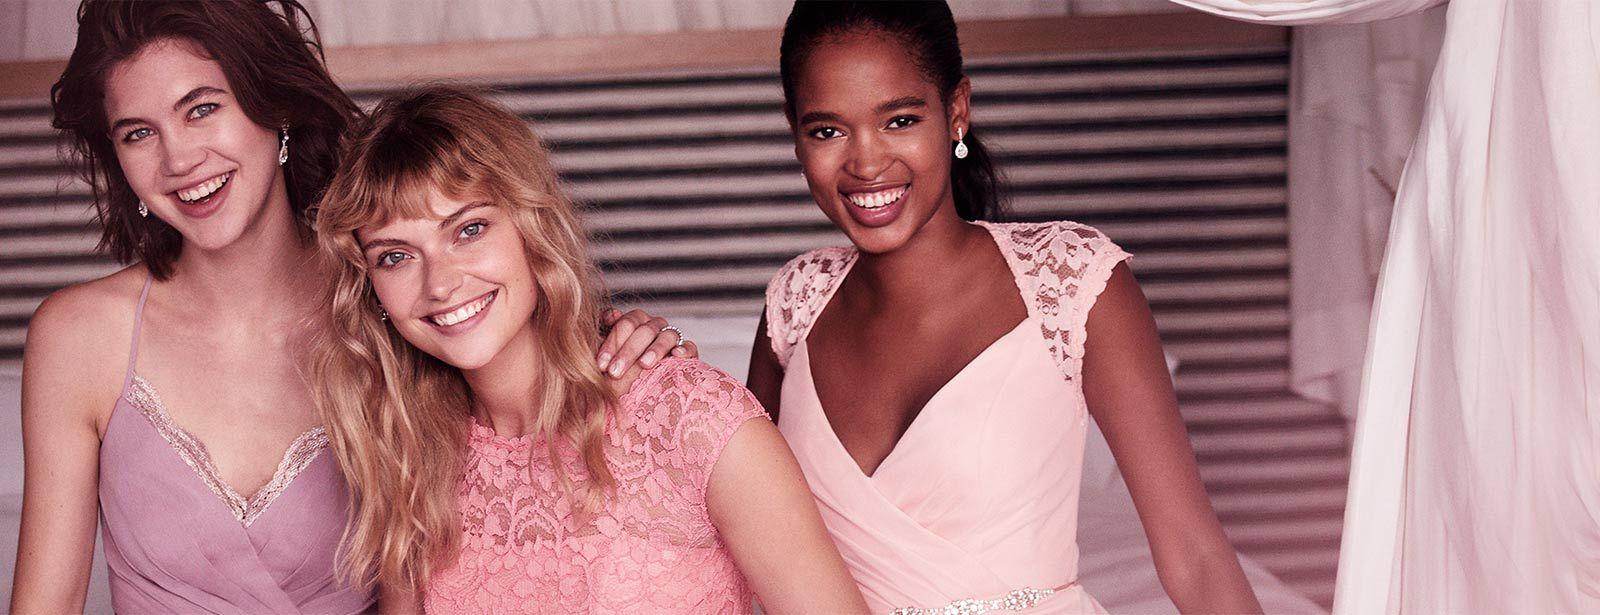 Three Bridesmaids Perfectly Mismatched   2018 #BrideTribe   Pinterest